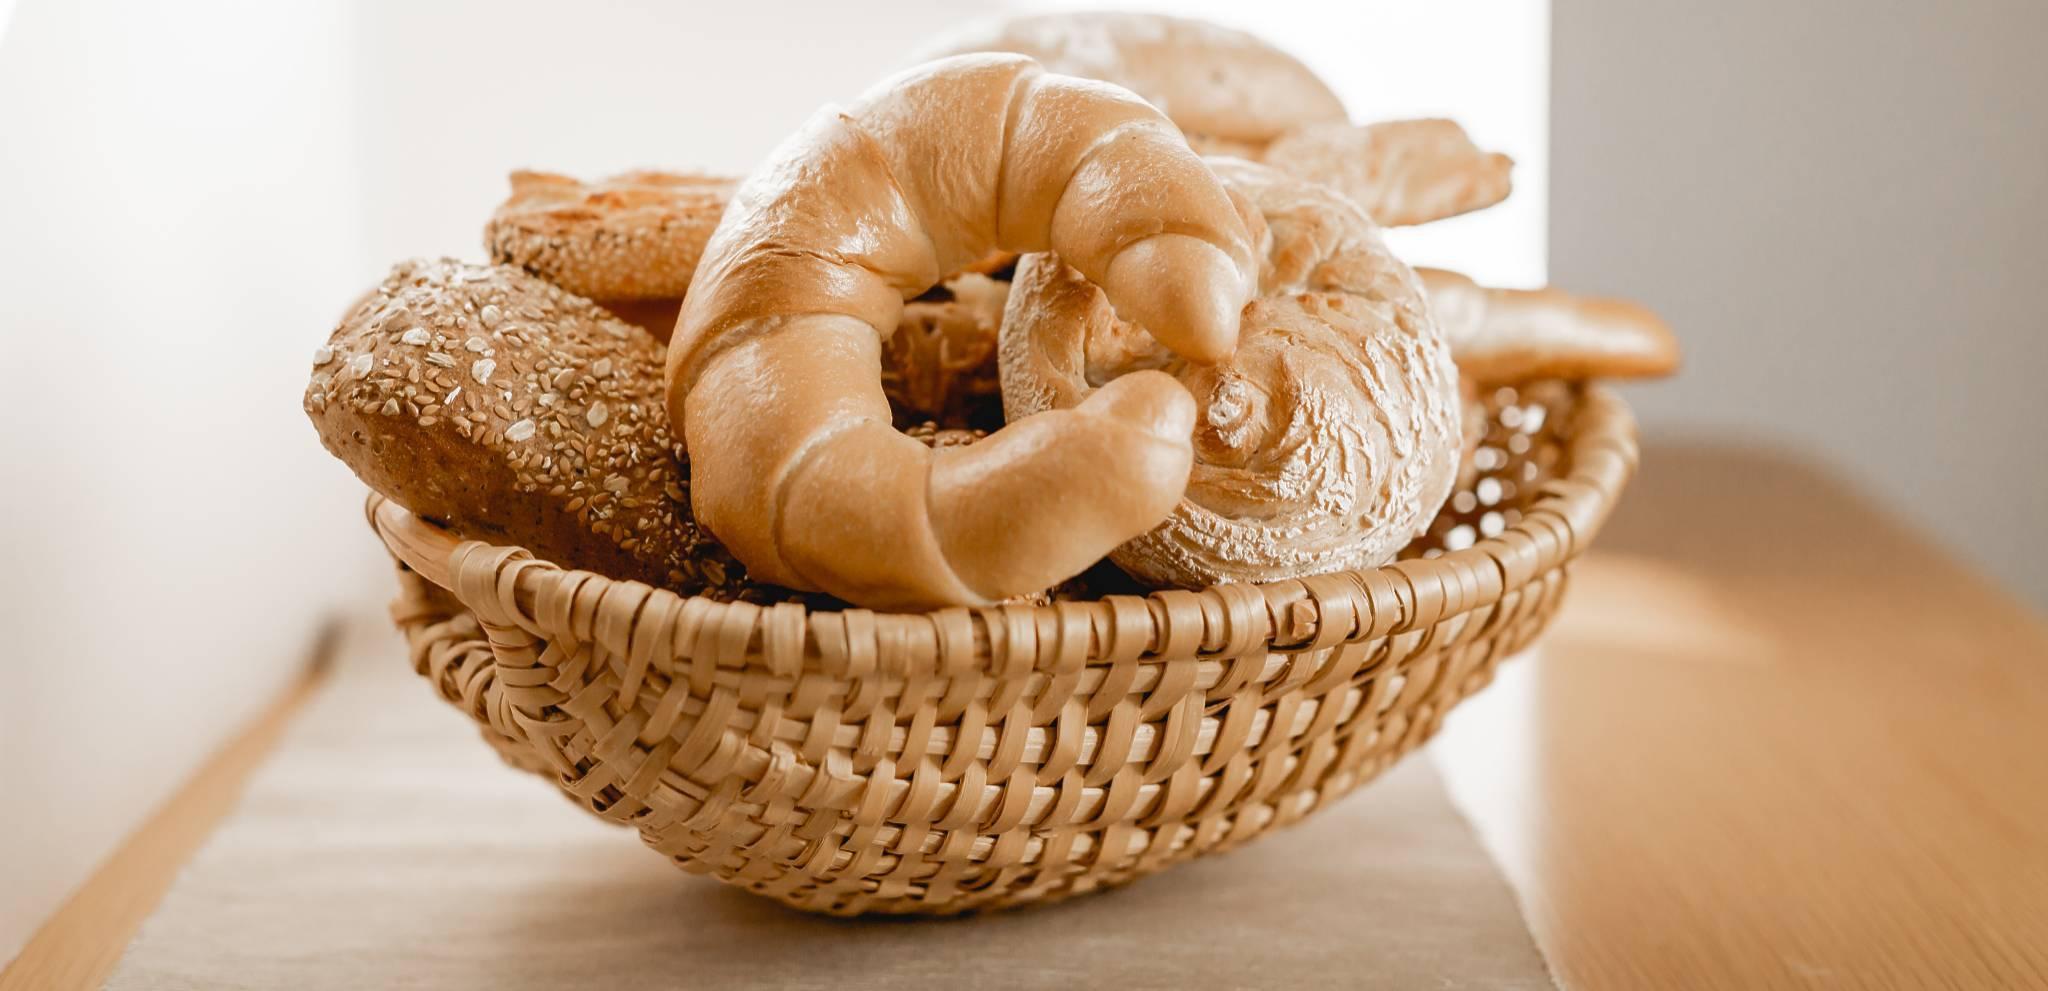 Bäckerei Konditorei Cafe Frühwirth Altmelon Gebäck-Klassiker